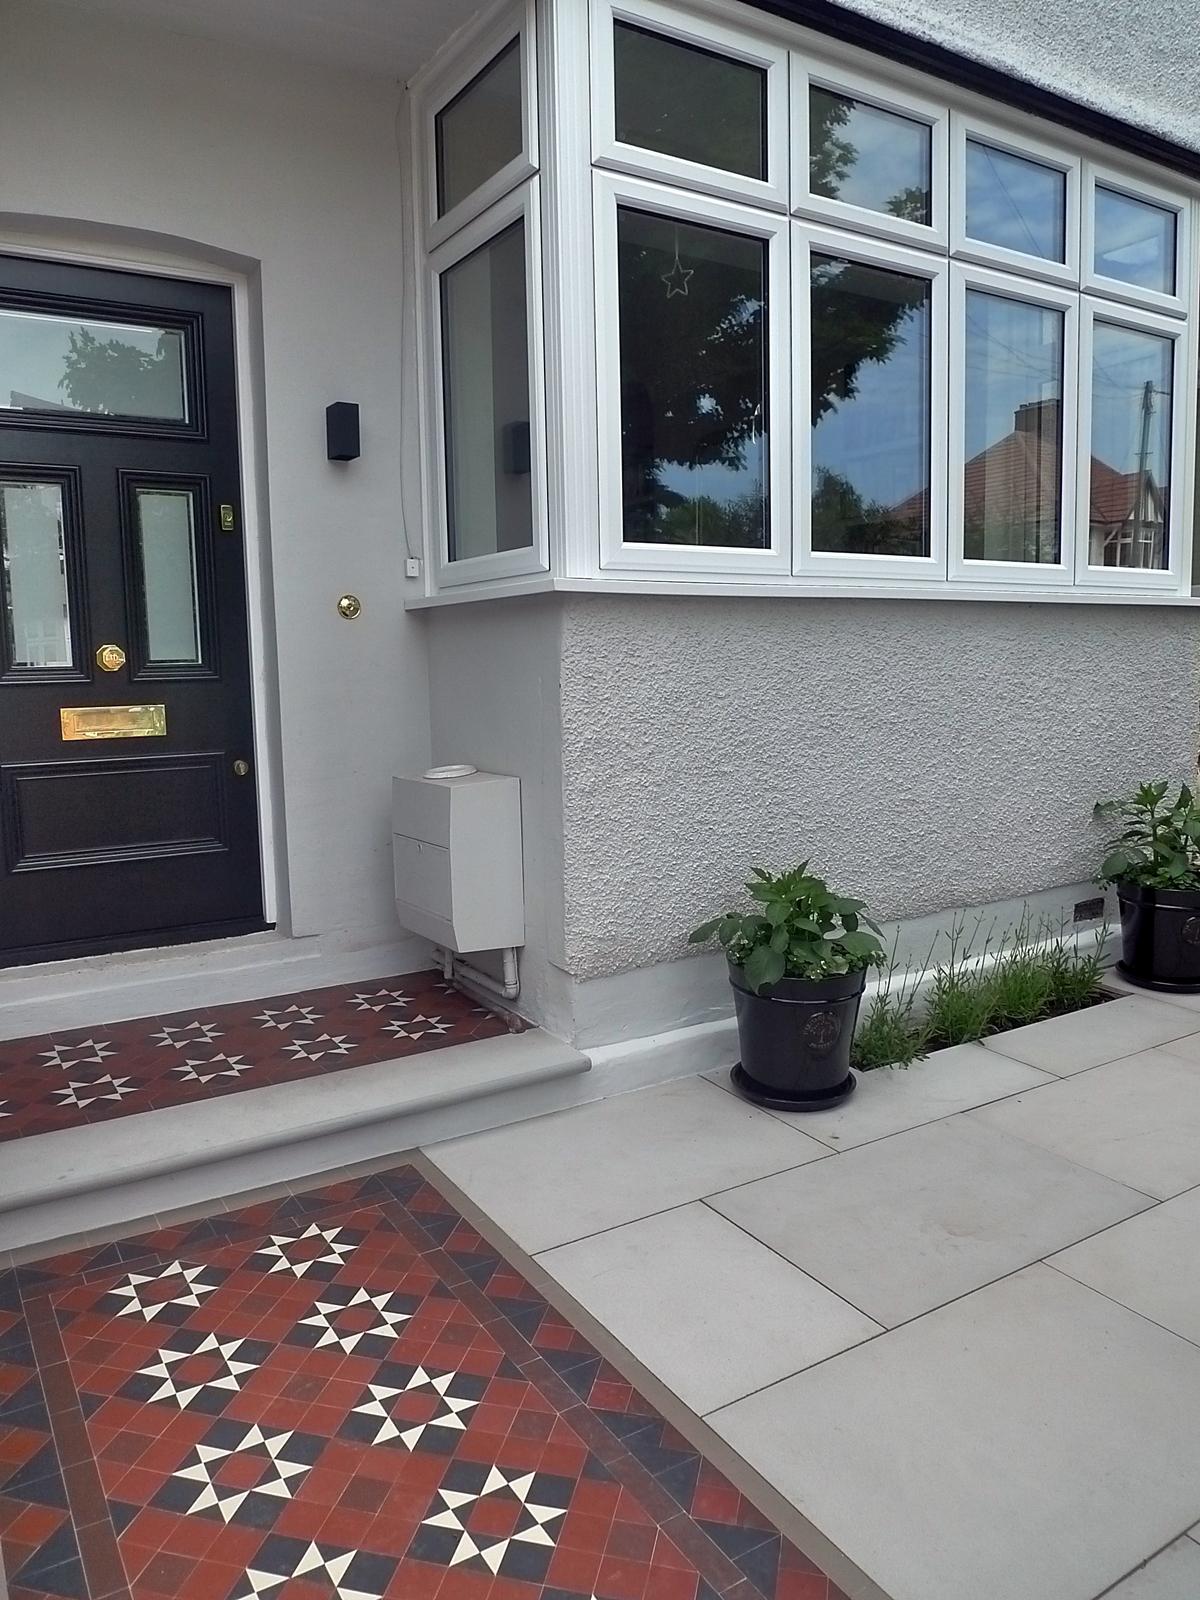 victorian edwardian mosaic tile path company balham clapham battersea southwark